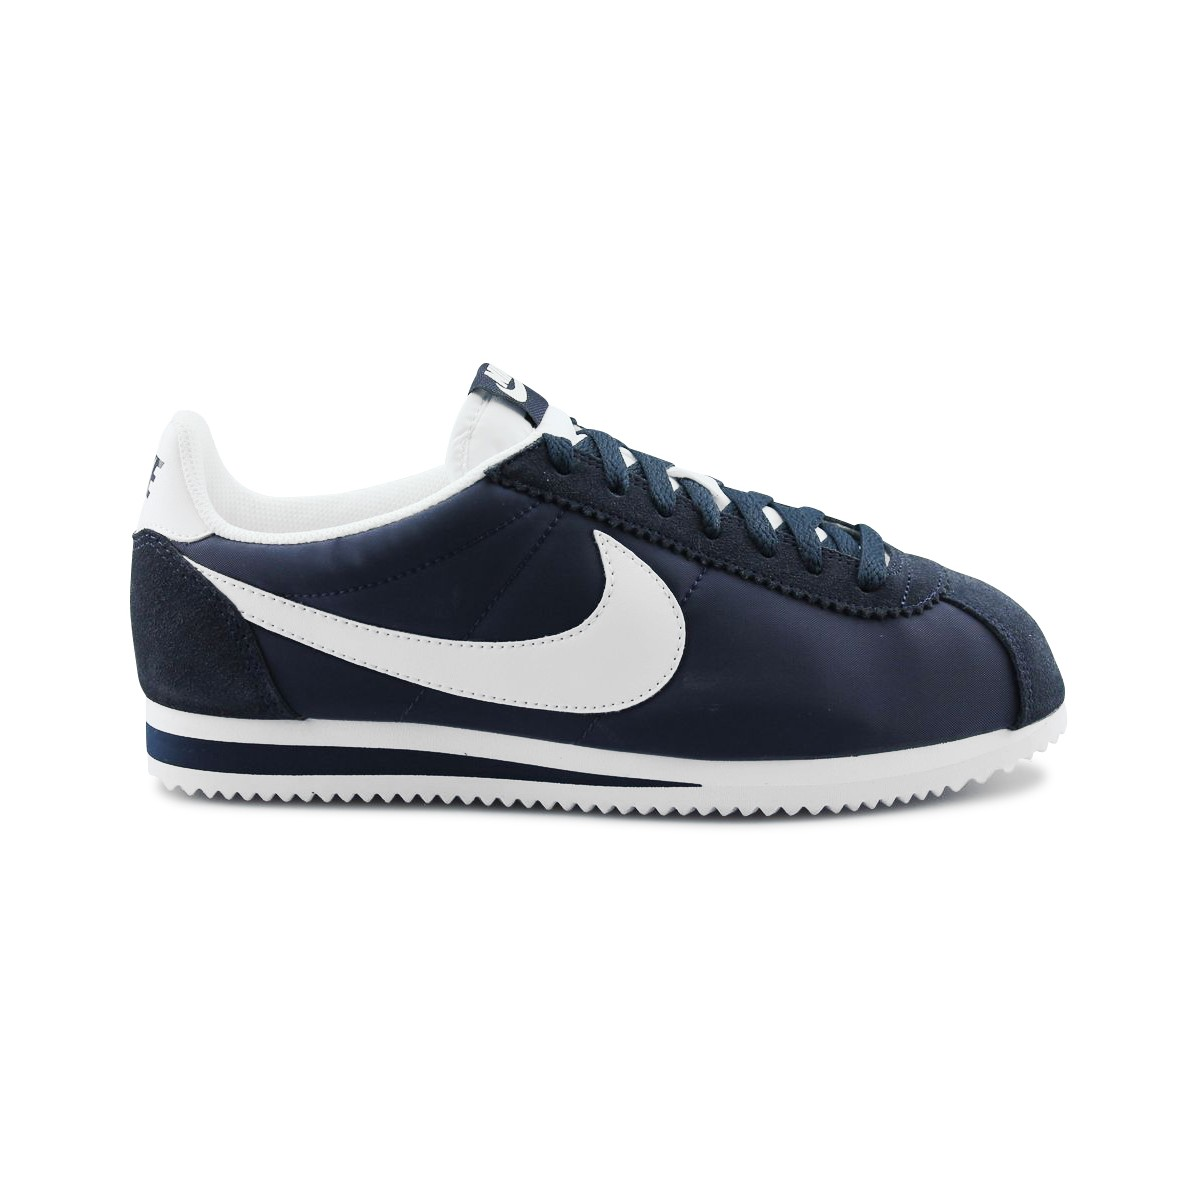 nike cortez nylon bleu,chaussures nike cortez nylon bleu